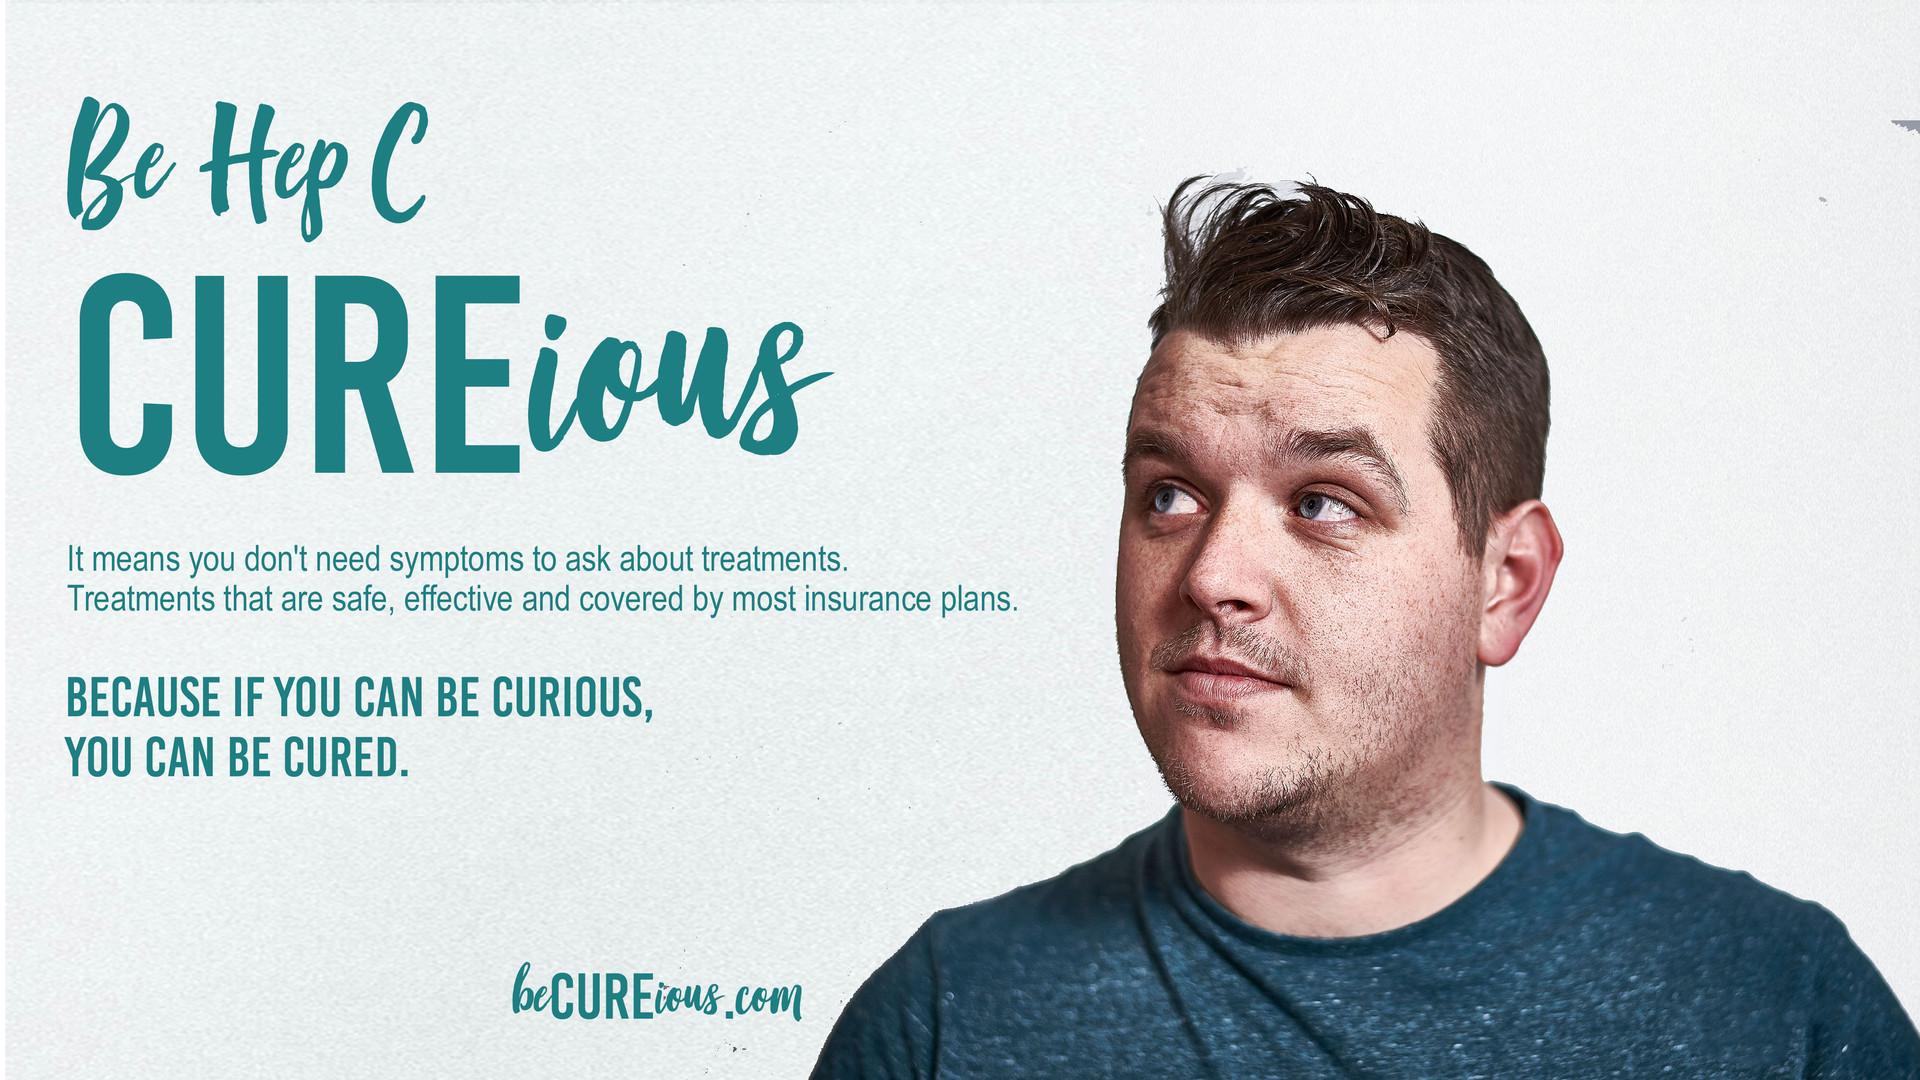 Cure_iousv3_ESArtboard 1 copy 3.jpg